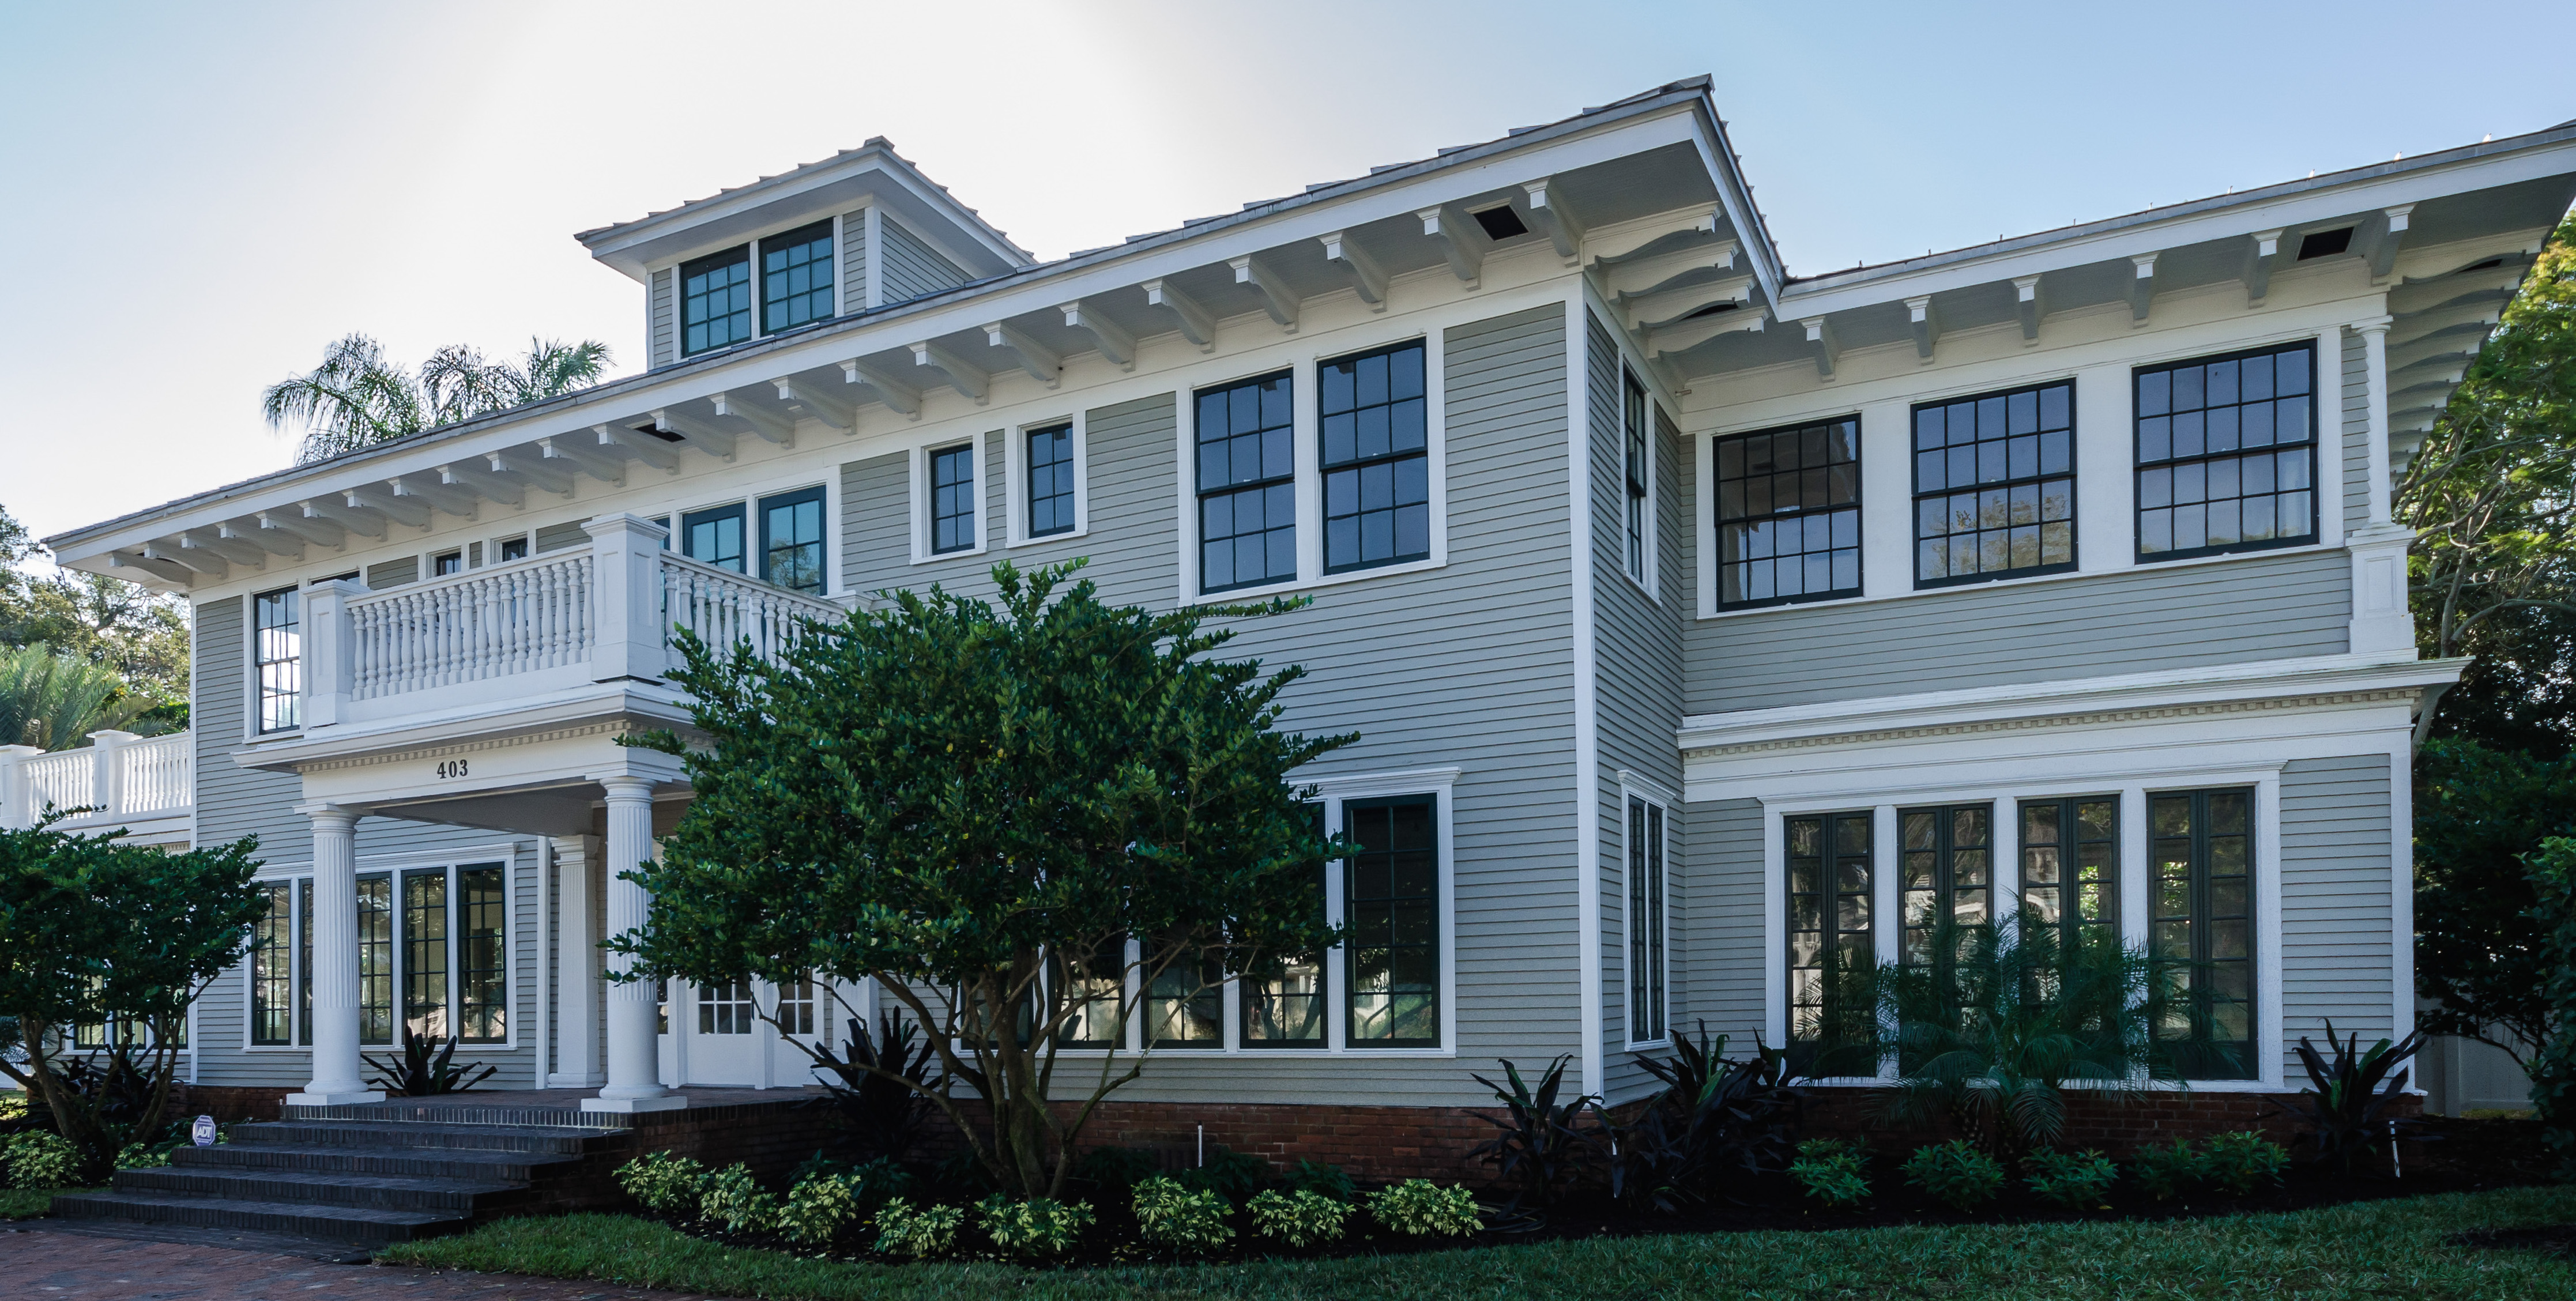 Strobel wins NARI Residential Historical Renovation and Restoration Award!